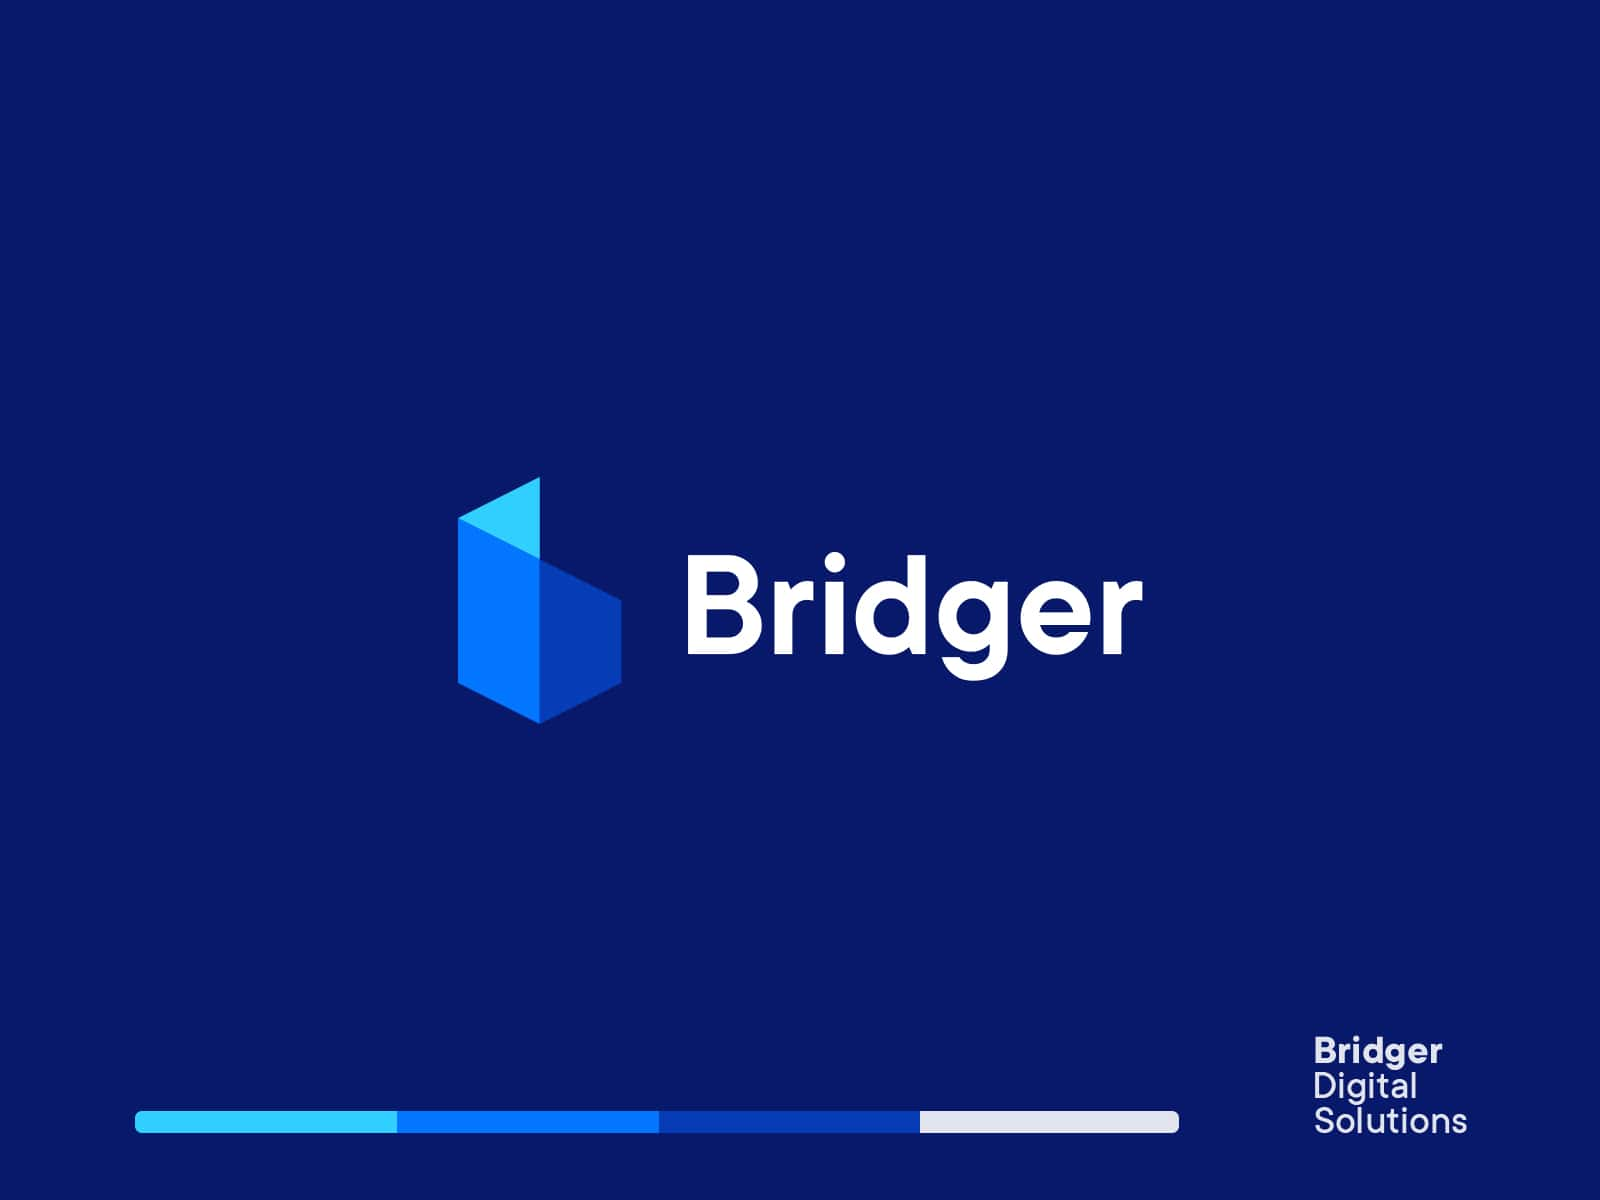 bridger-digital-solutions